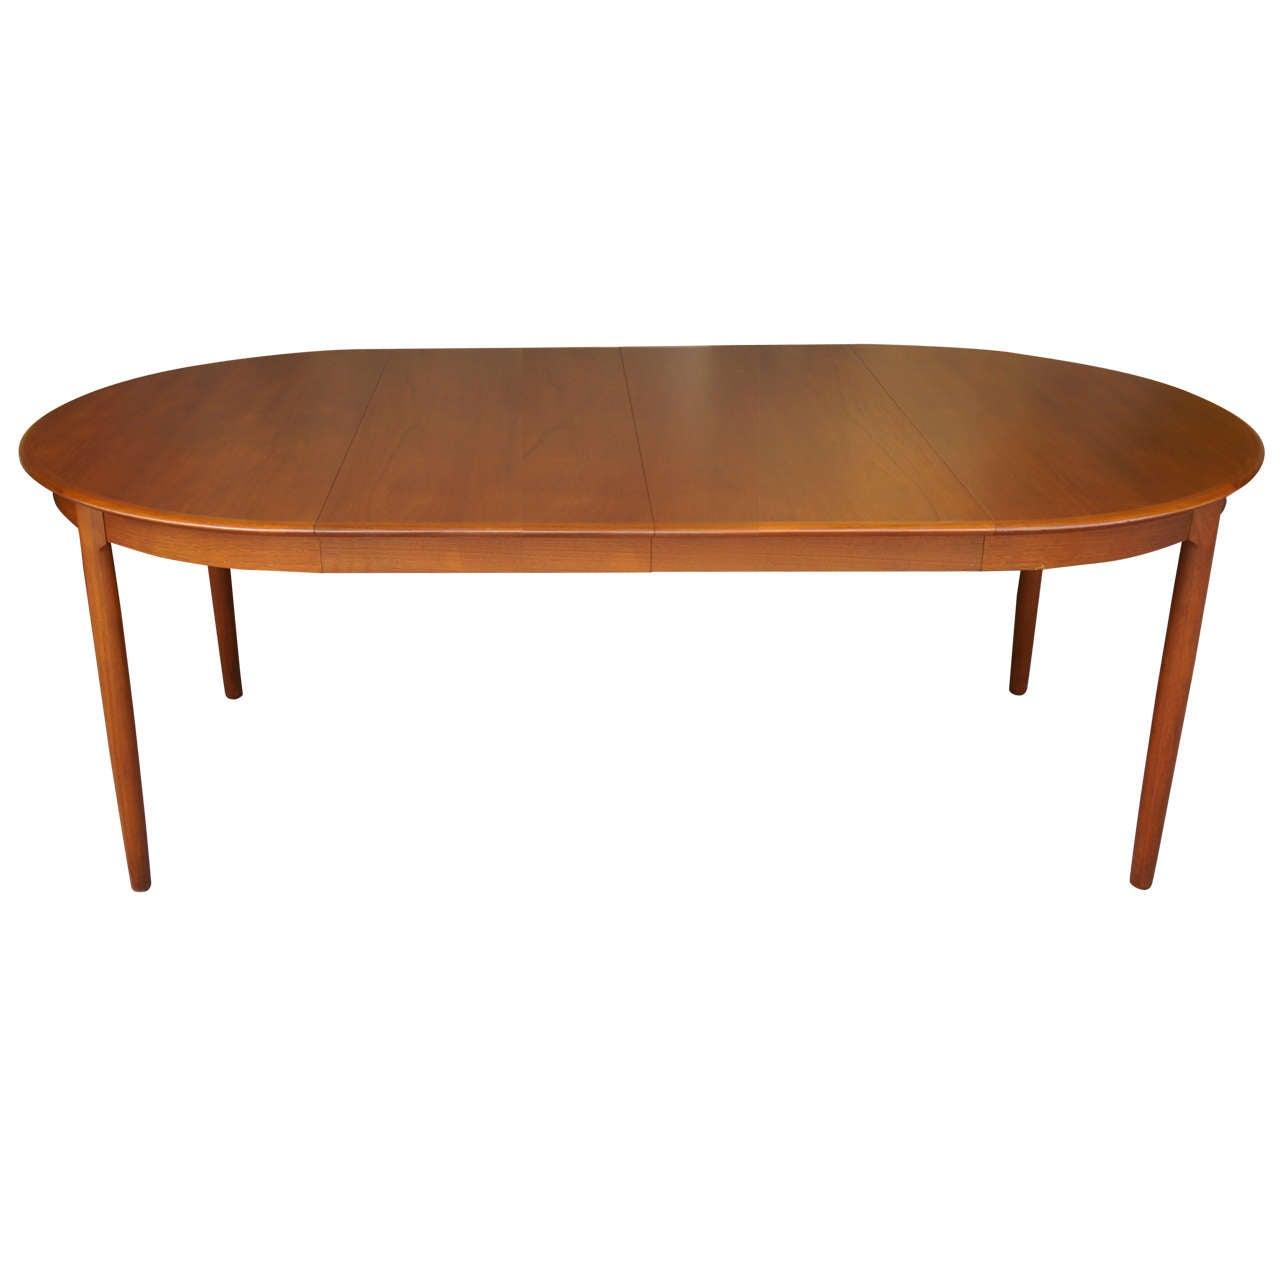 Danish modern teak dining table at 1stdibs for Modern dining table